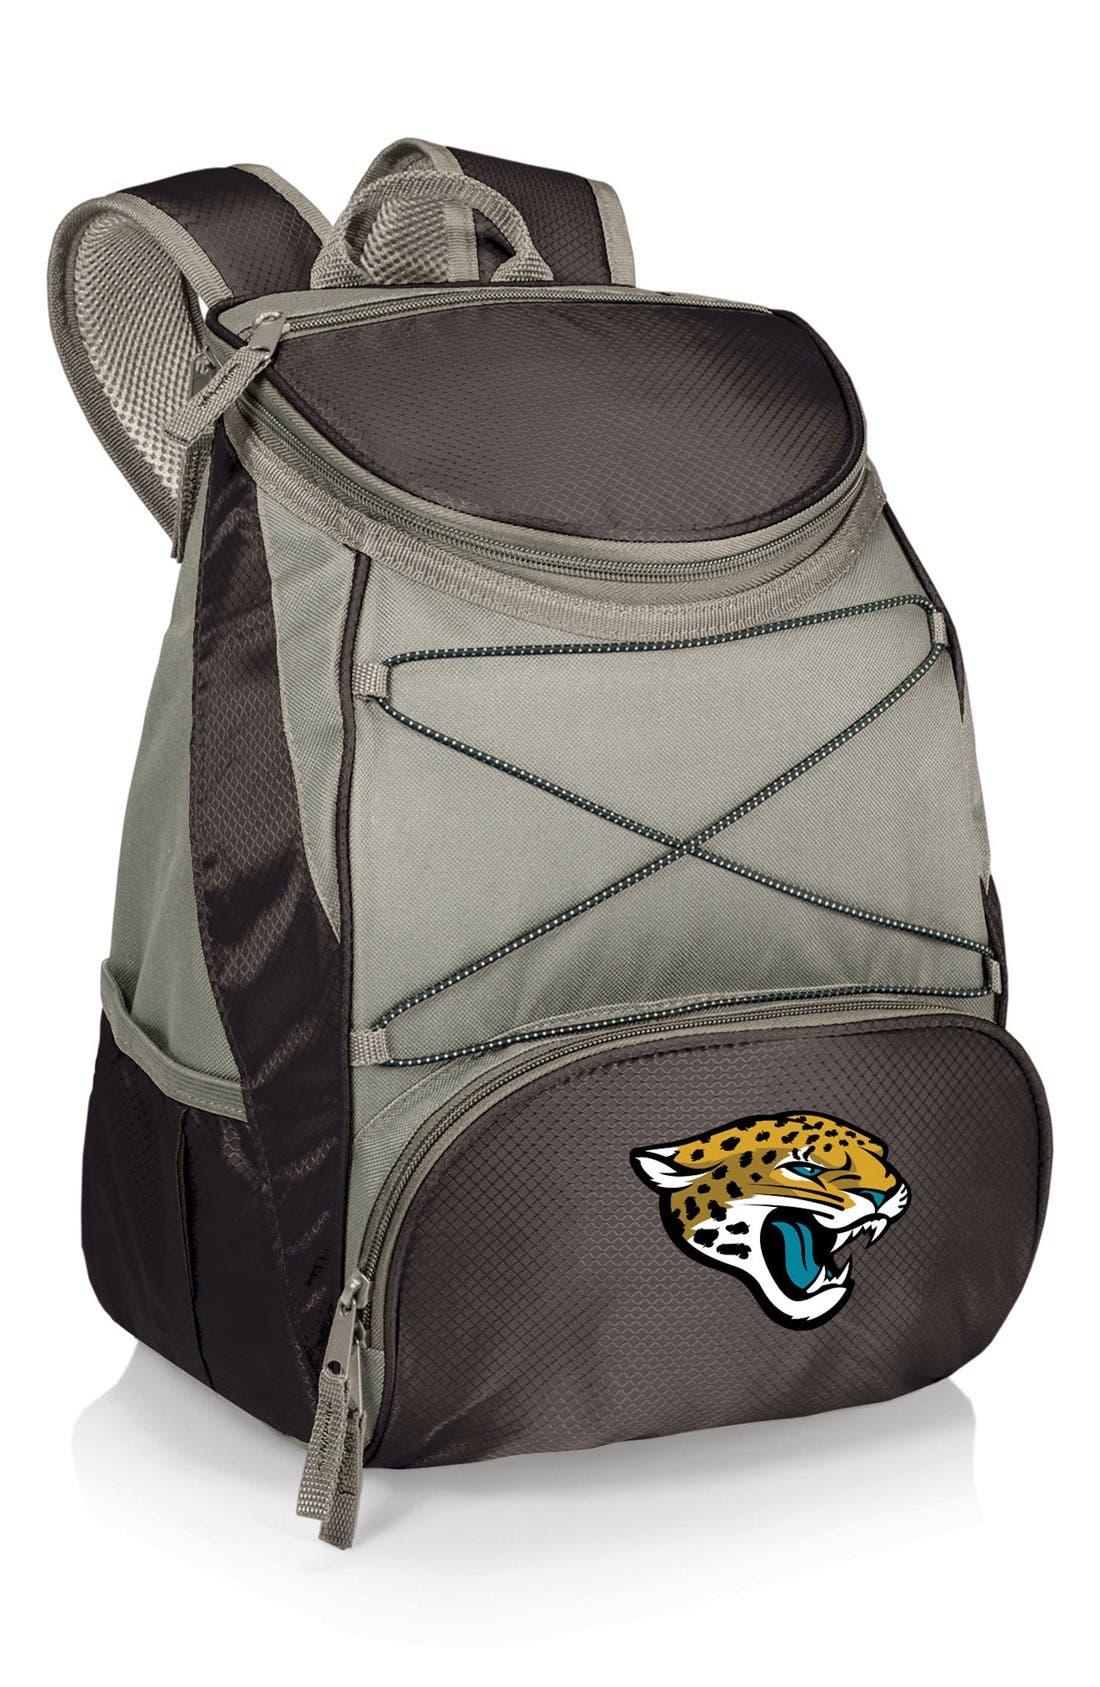 'PTX' Water Resistant Backpack Cooler,                             Main thumbnail 1, color,                             Jacksonville Jaguars